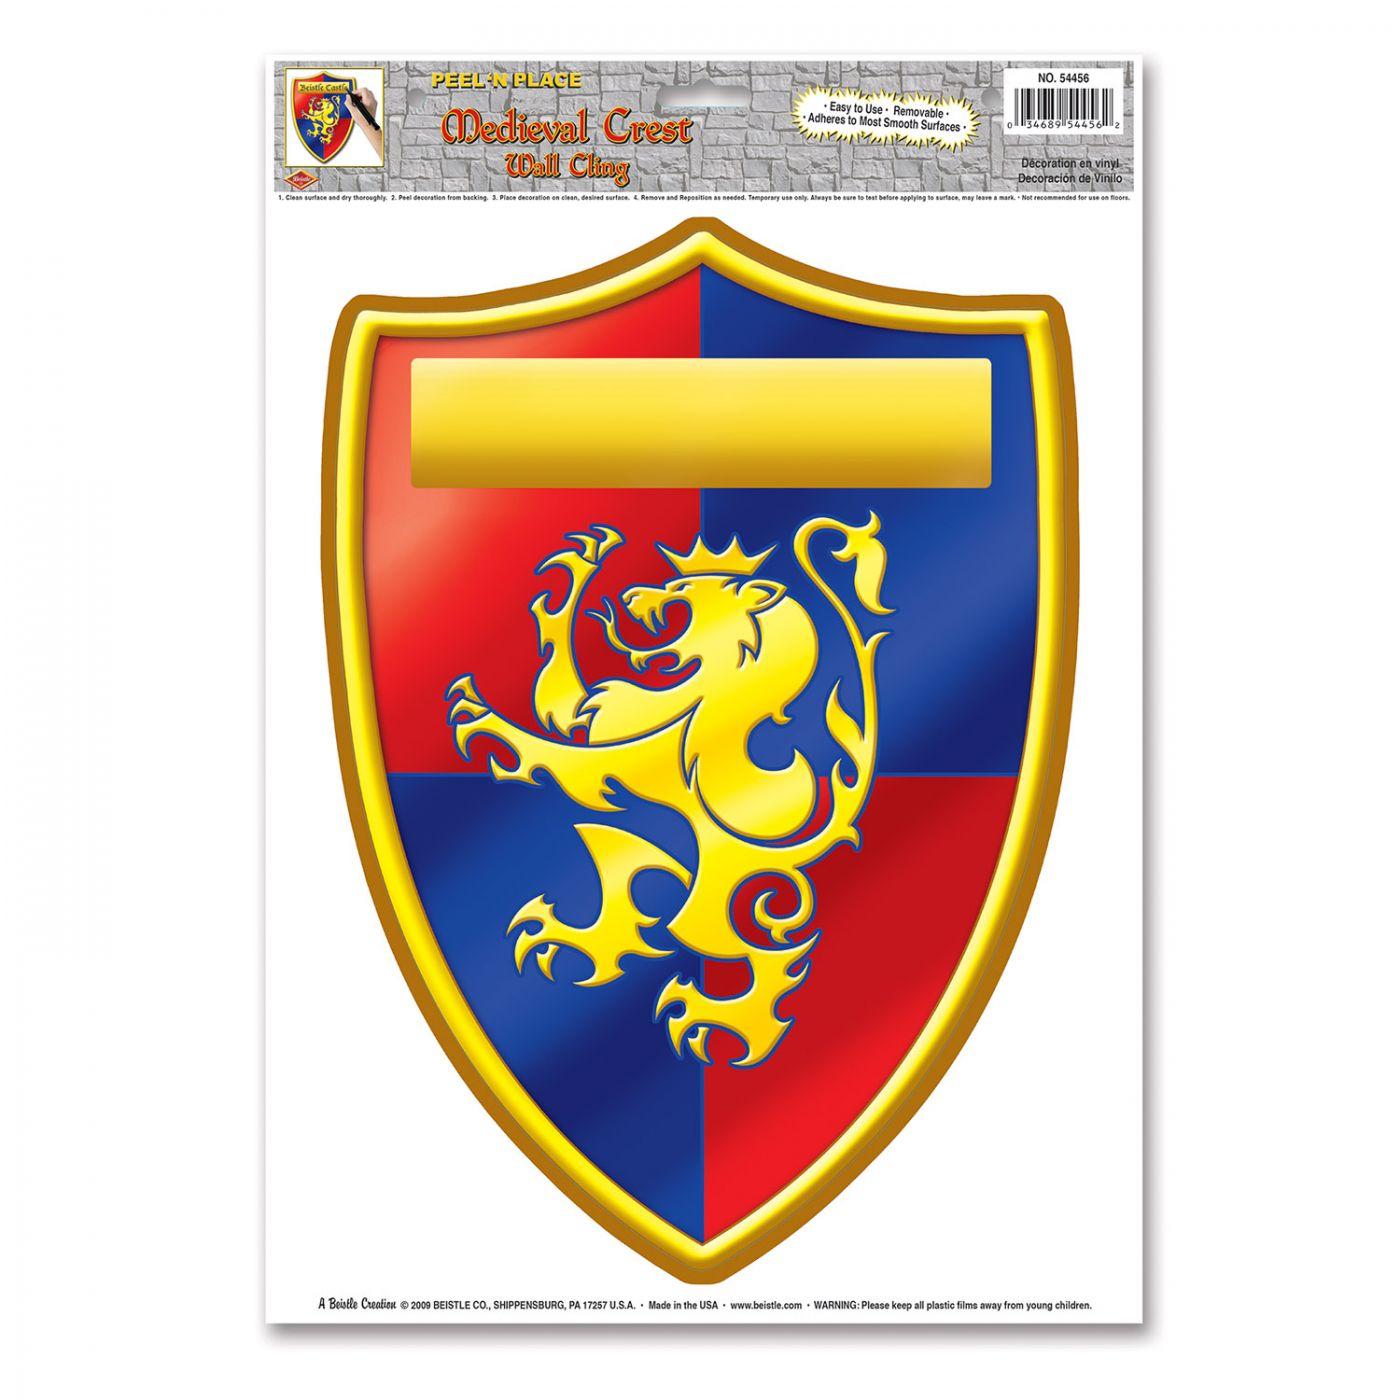 Medieval Crest Peel 'N Place image